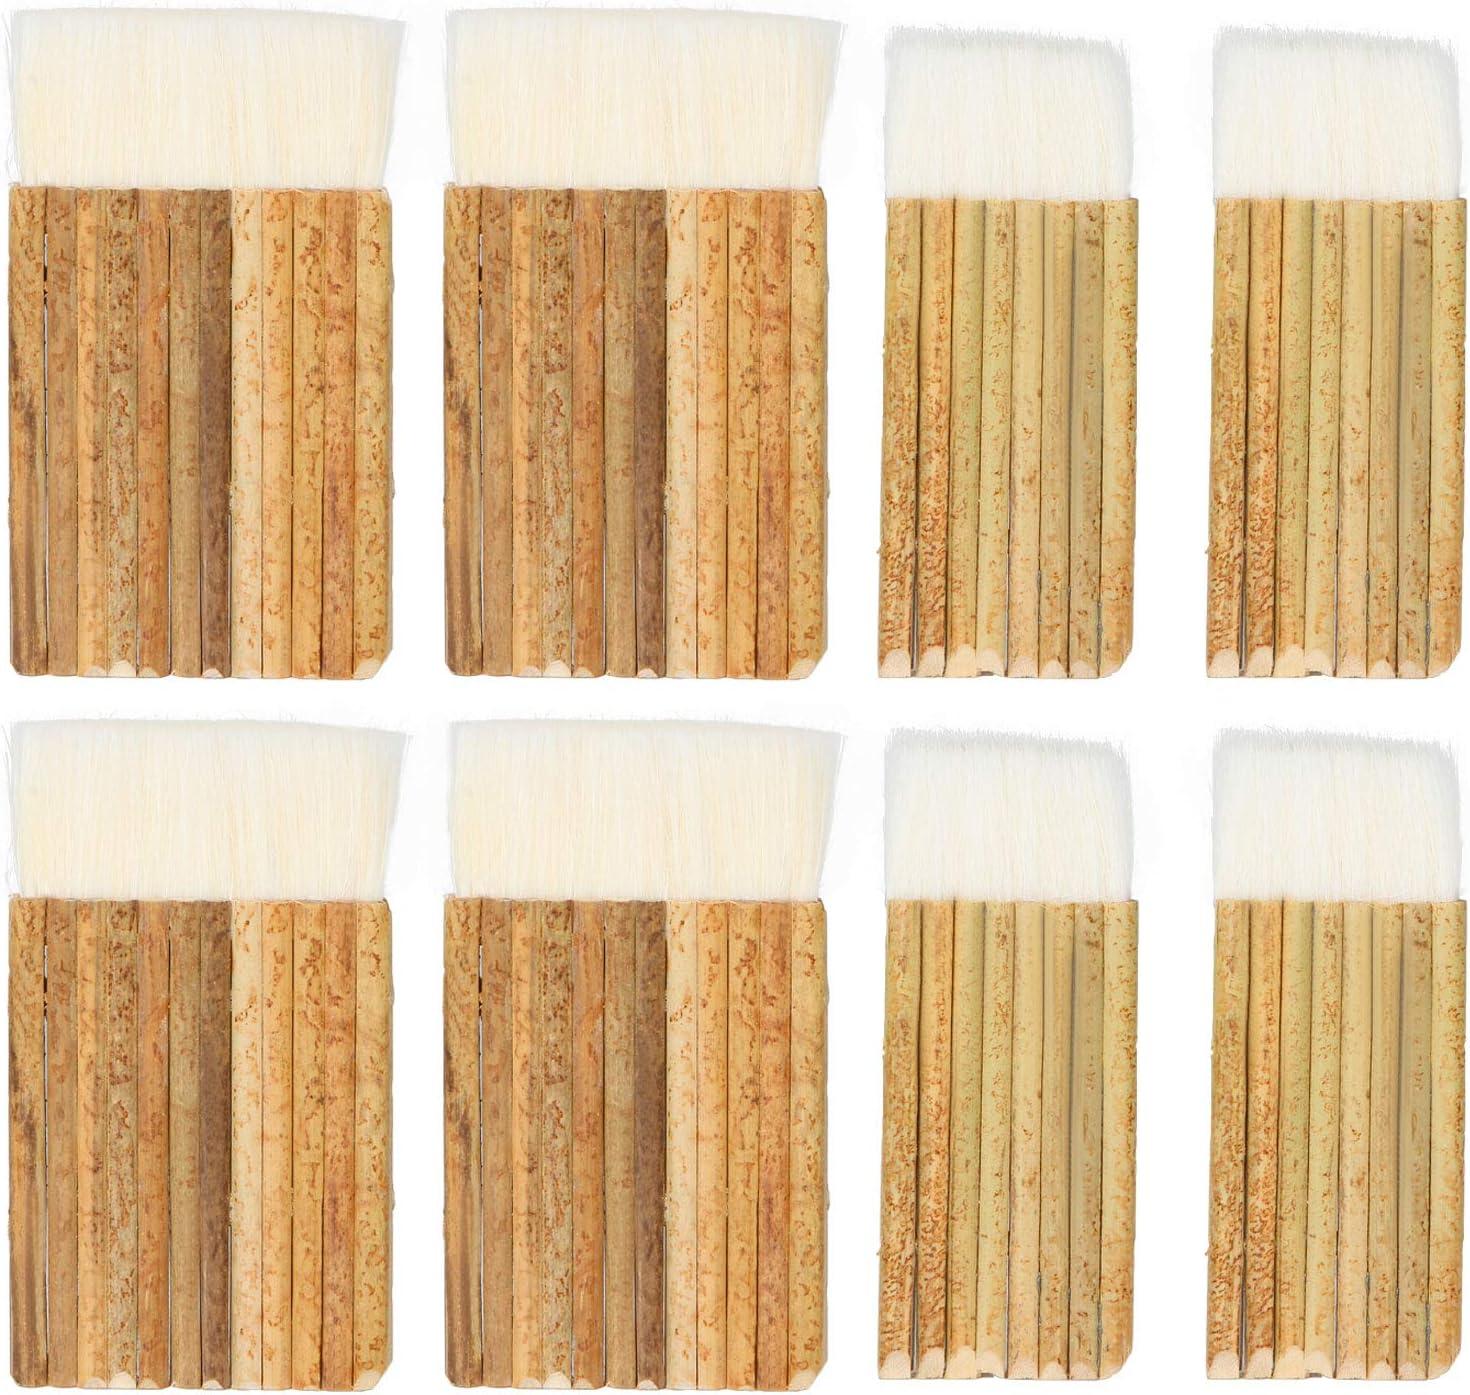 HNBun 8 PCS Sheep Hair Hake Brush, Bamboo Handle Hake Blender Brush for Kiln Wash, Watercolor, Dust Cleaning, Ceramic, Pottery Painting